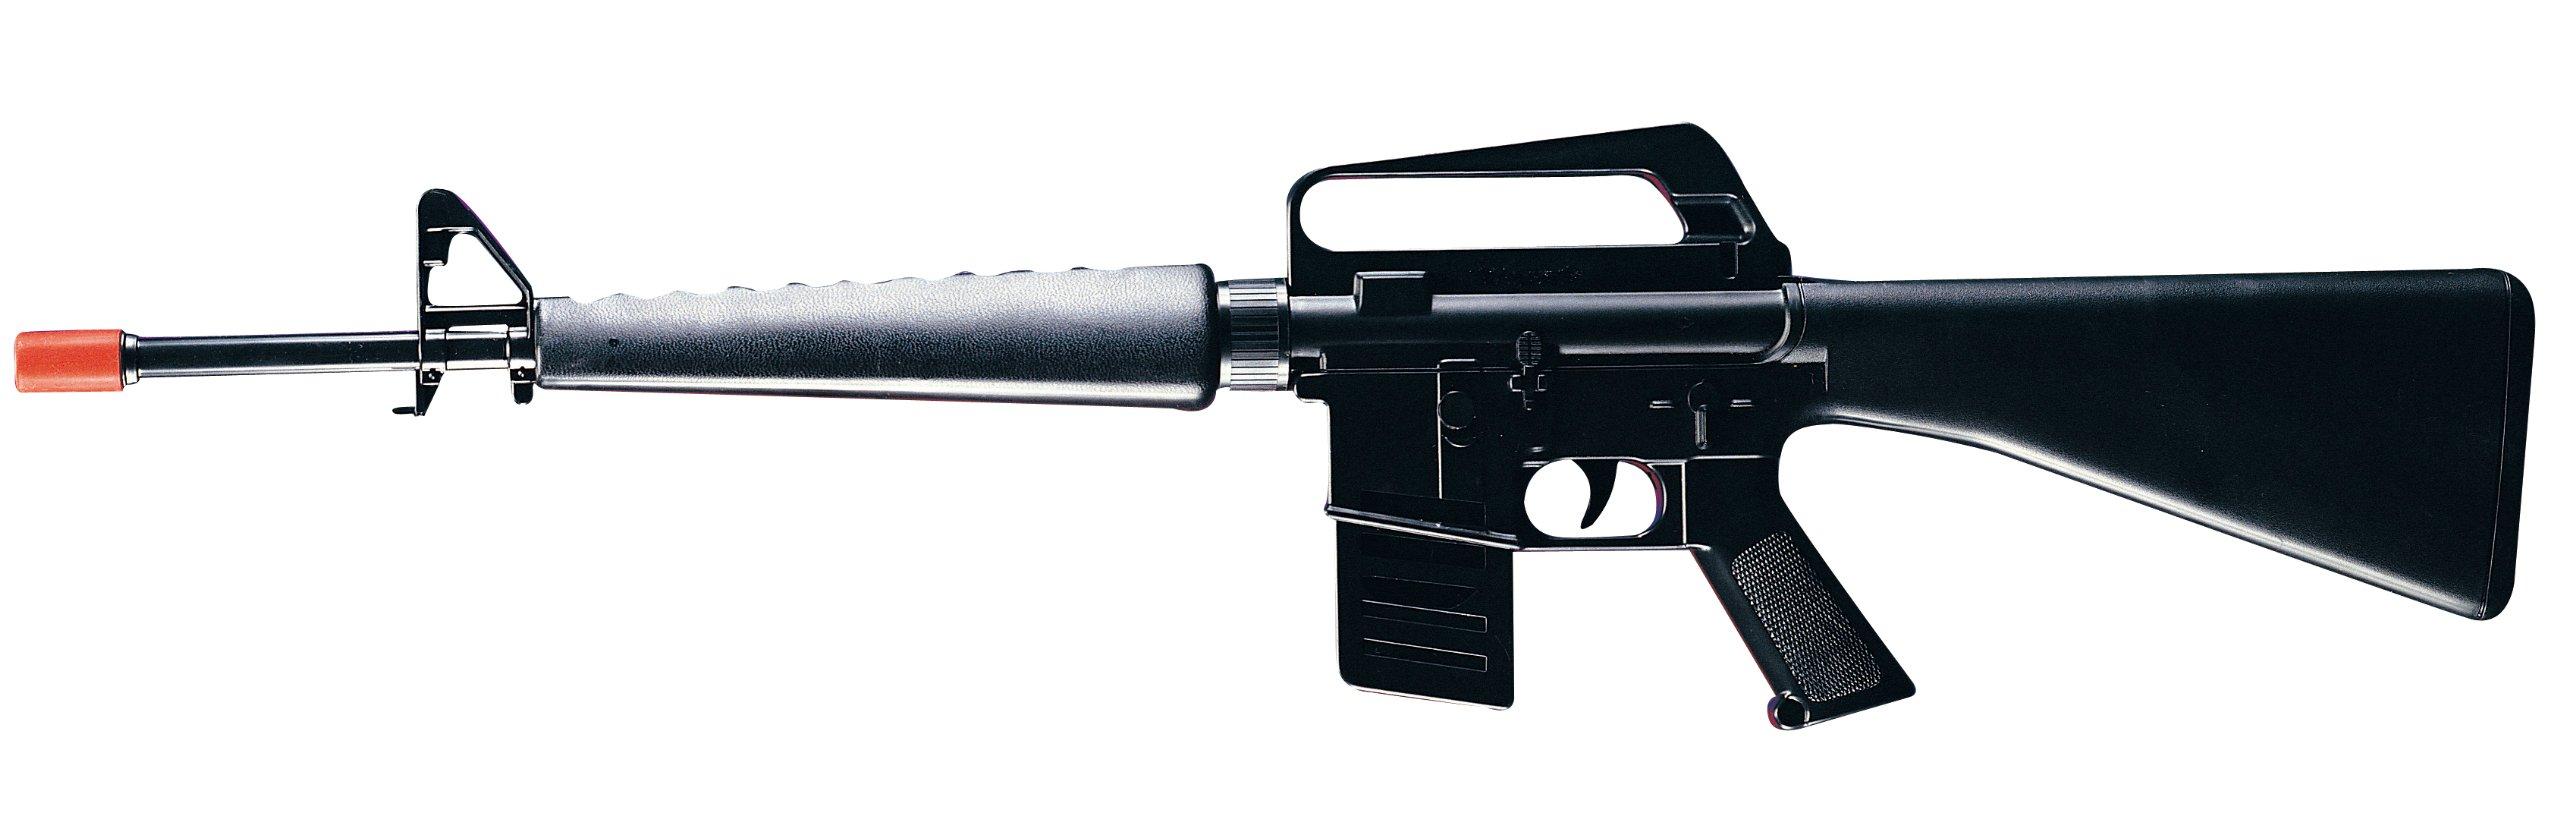 Rubie's Costume Co M-16 Machine Gun Costume